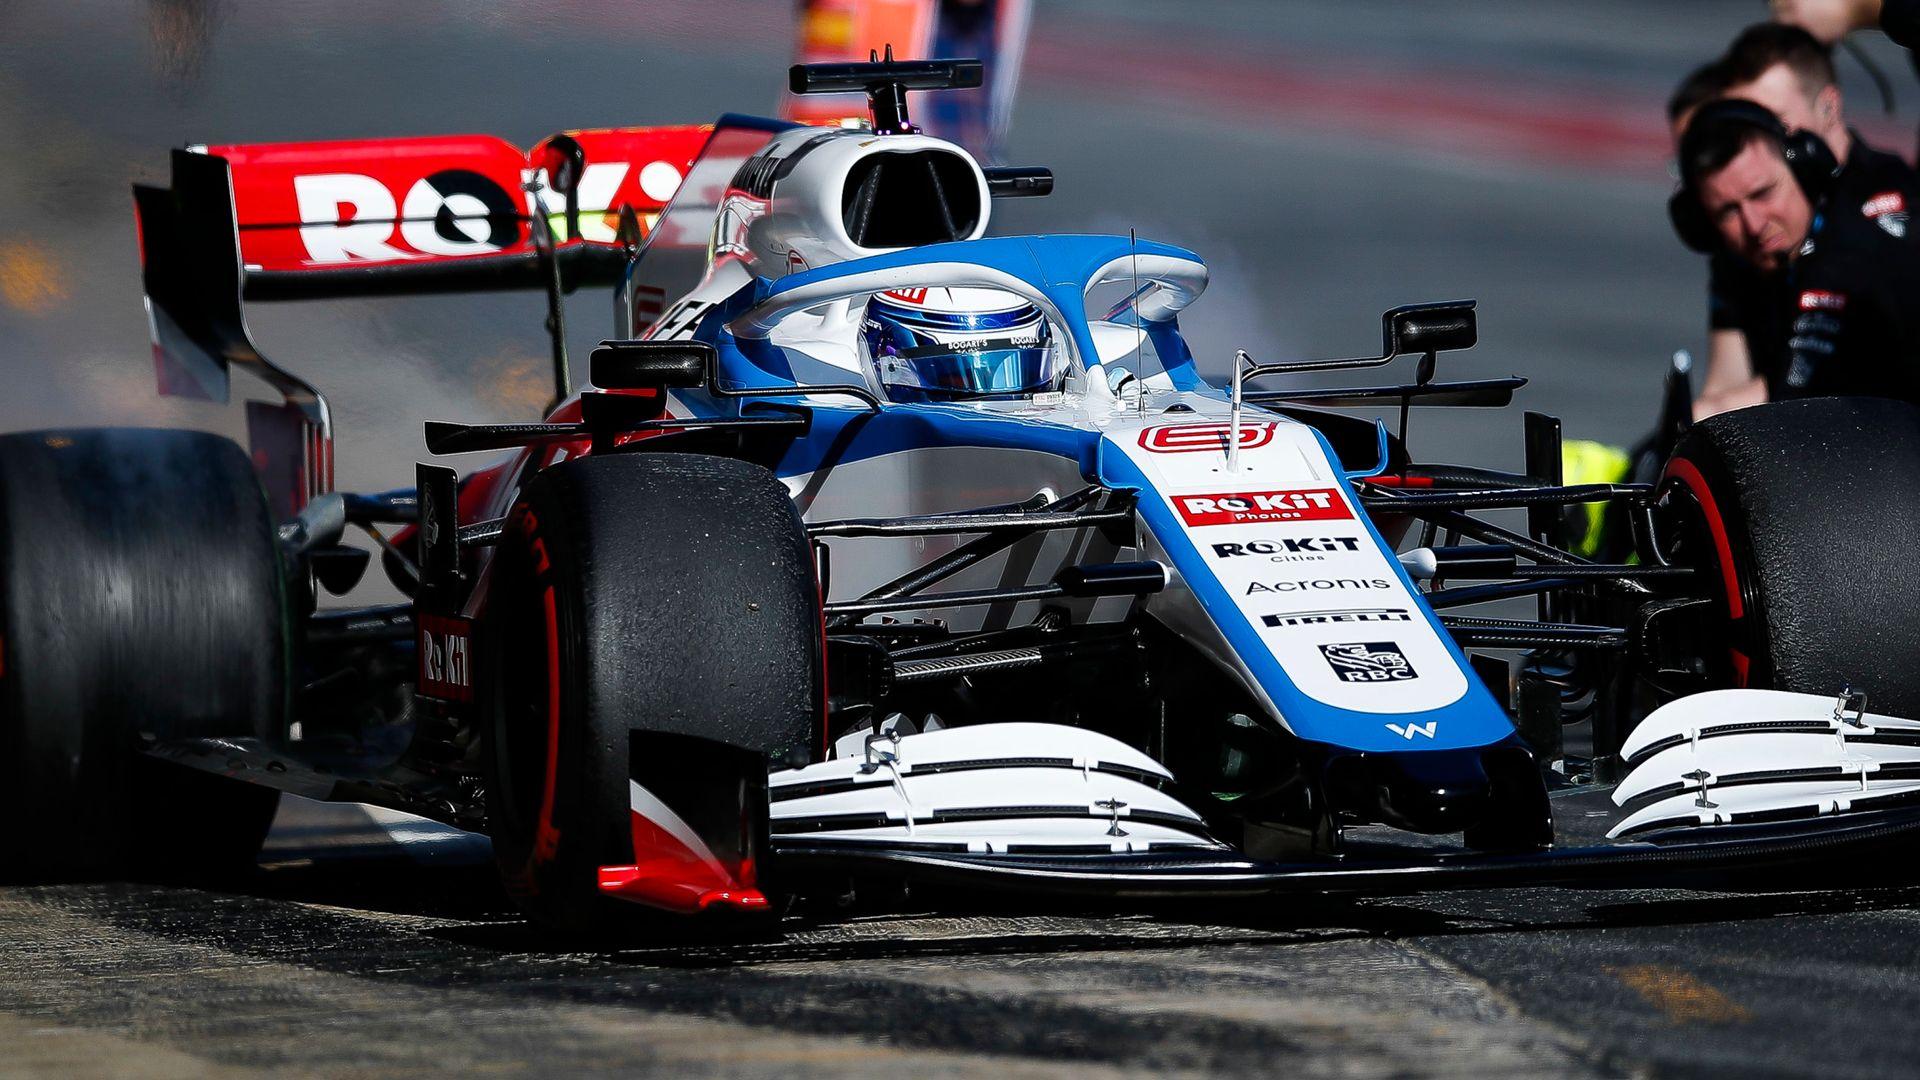 Williams consider selling F1 team